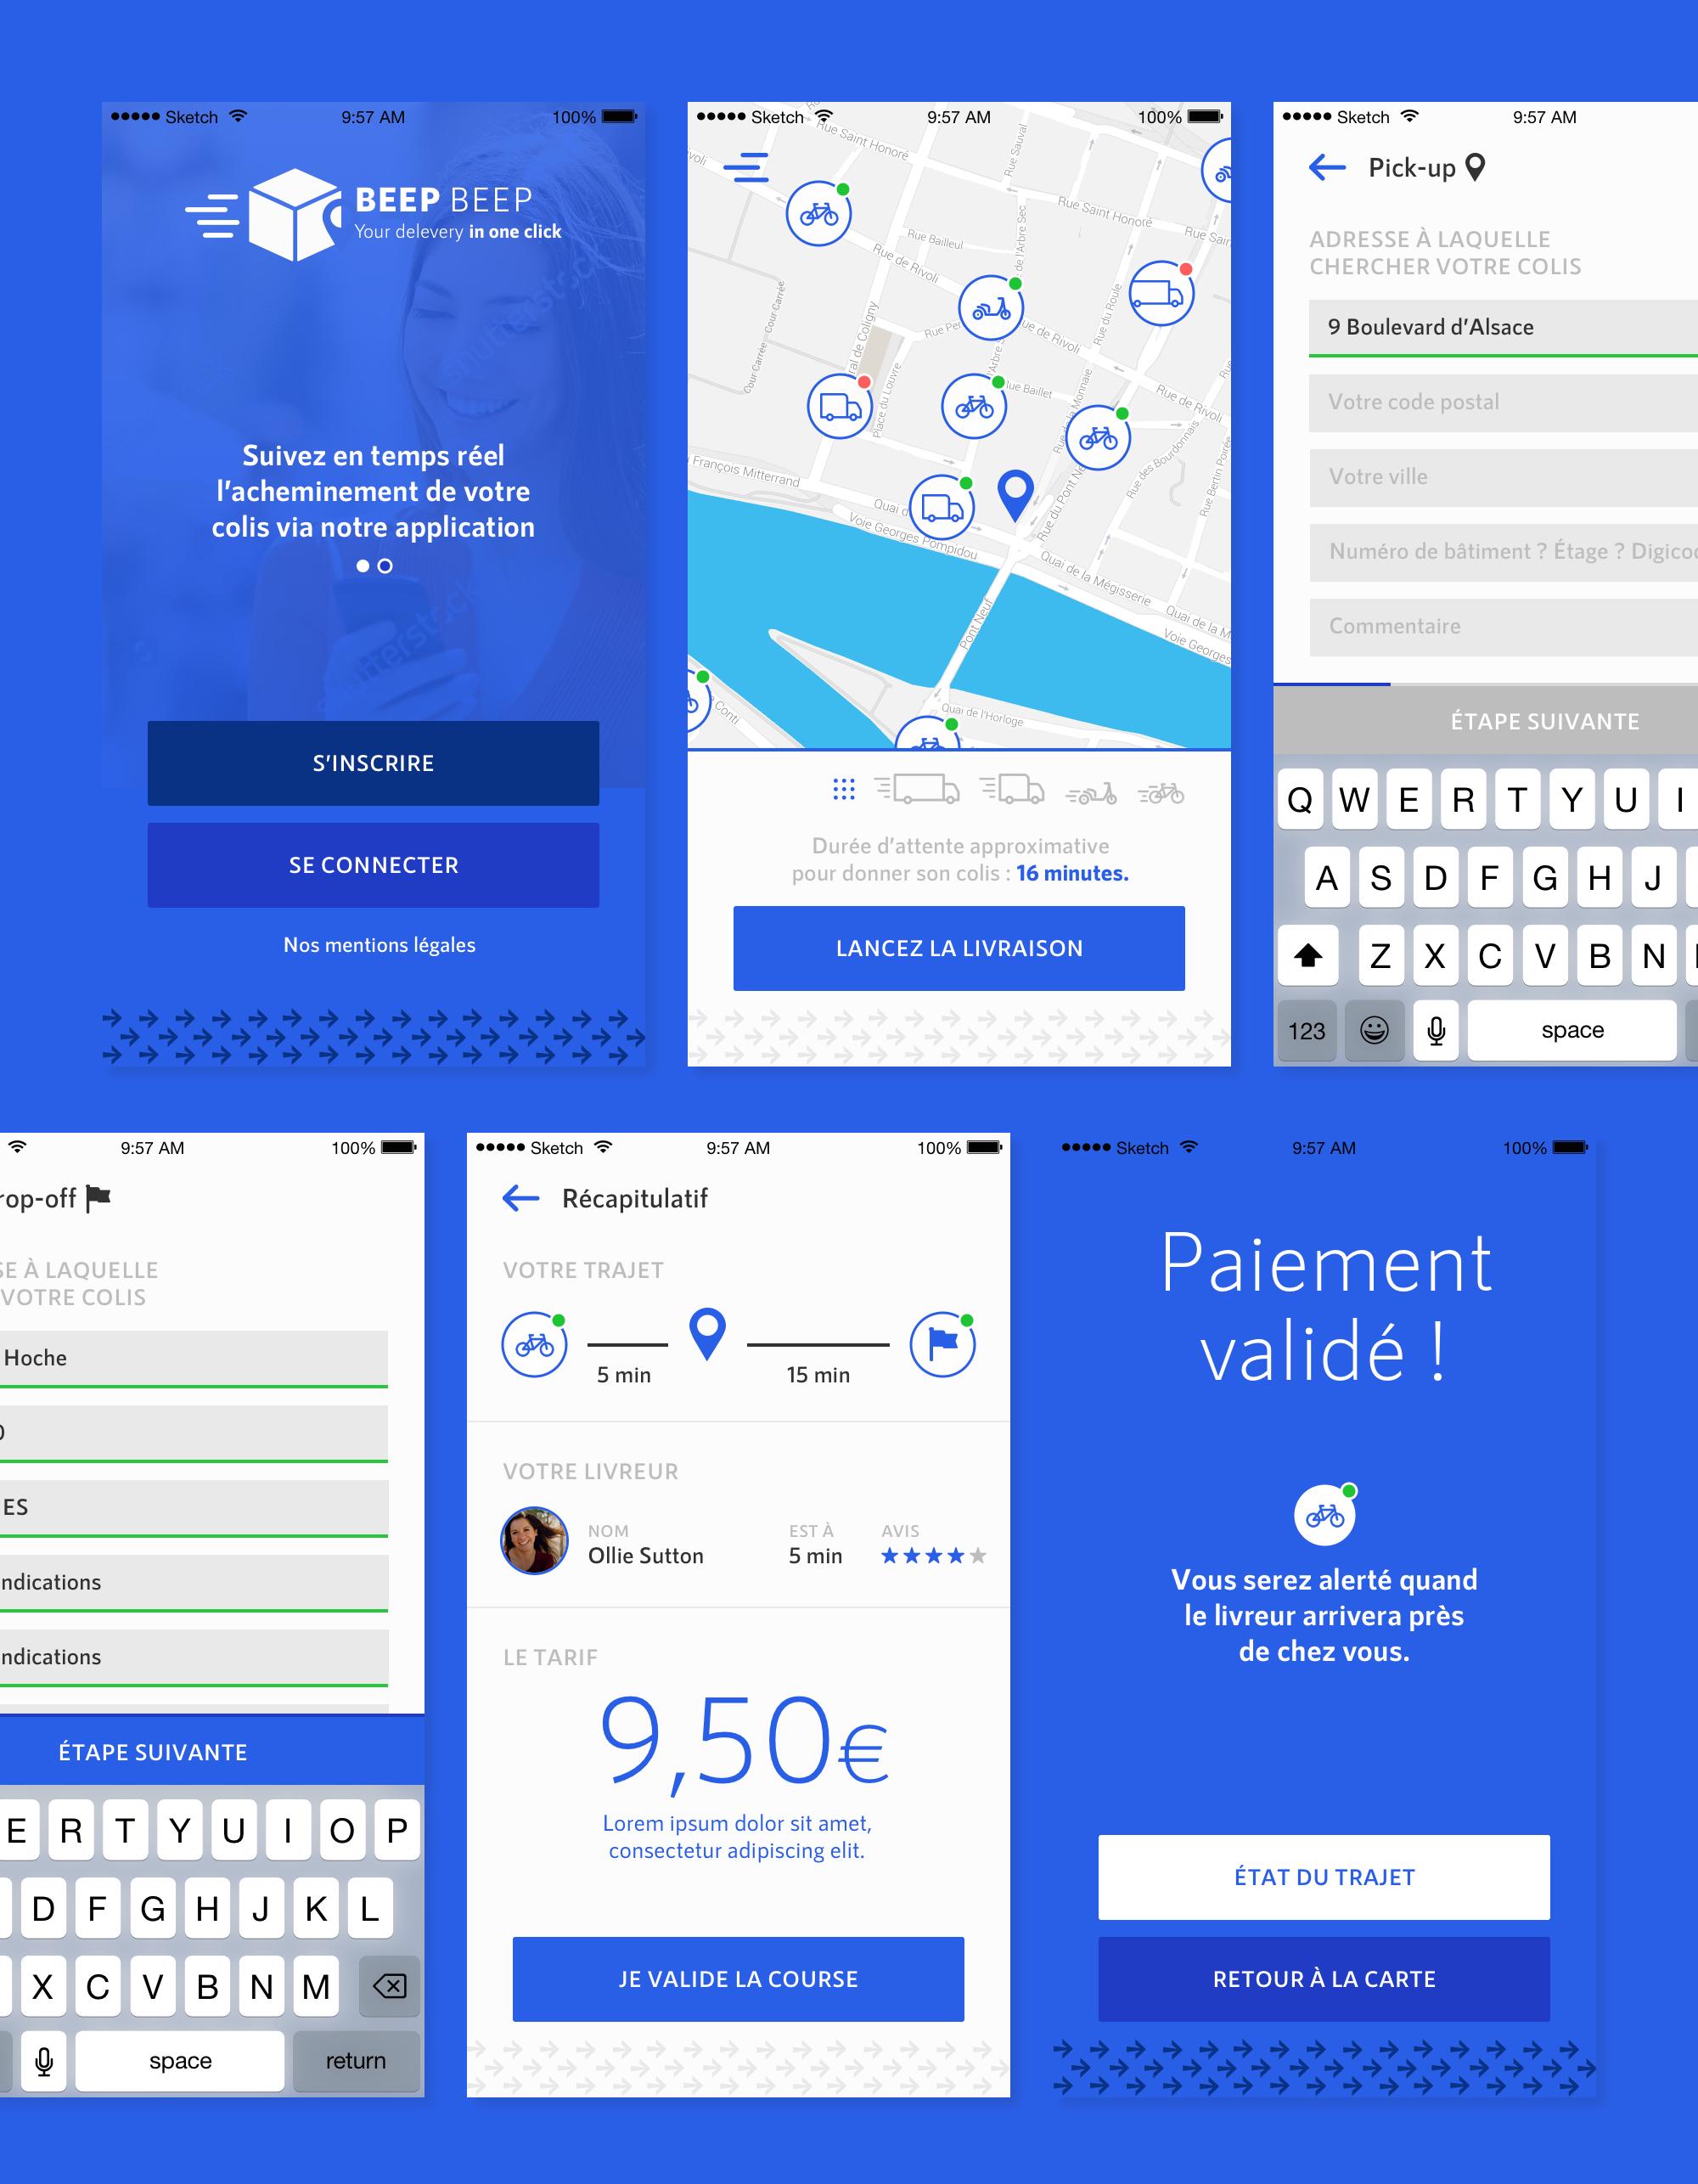 Projet Beep Beep, Quentin Degrange, webdesigner UI/UX Cannes, Nice, Monaco